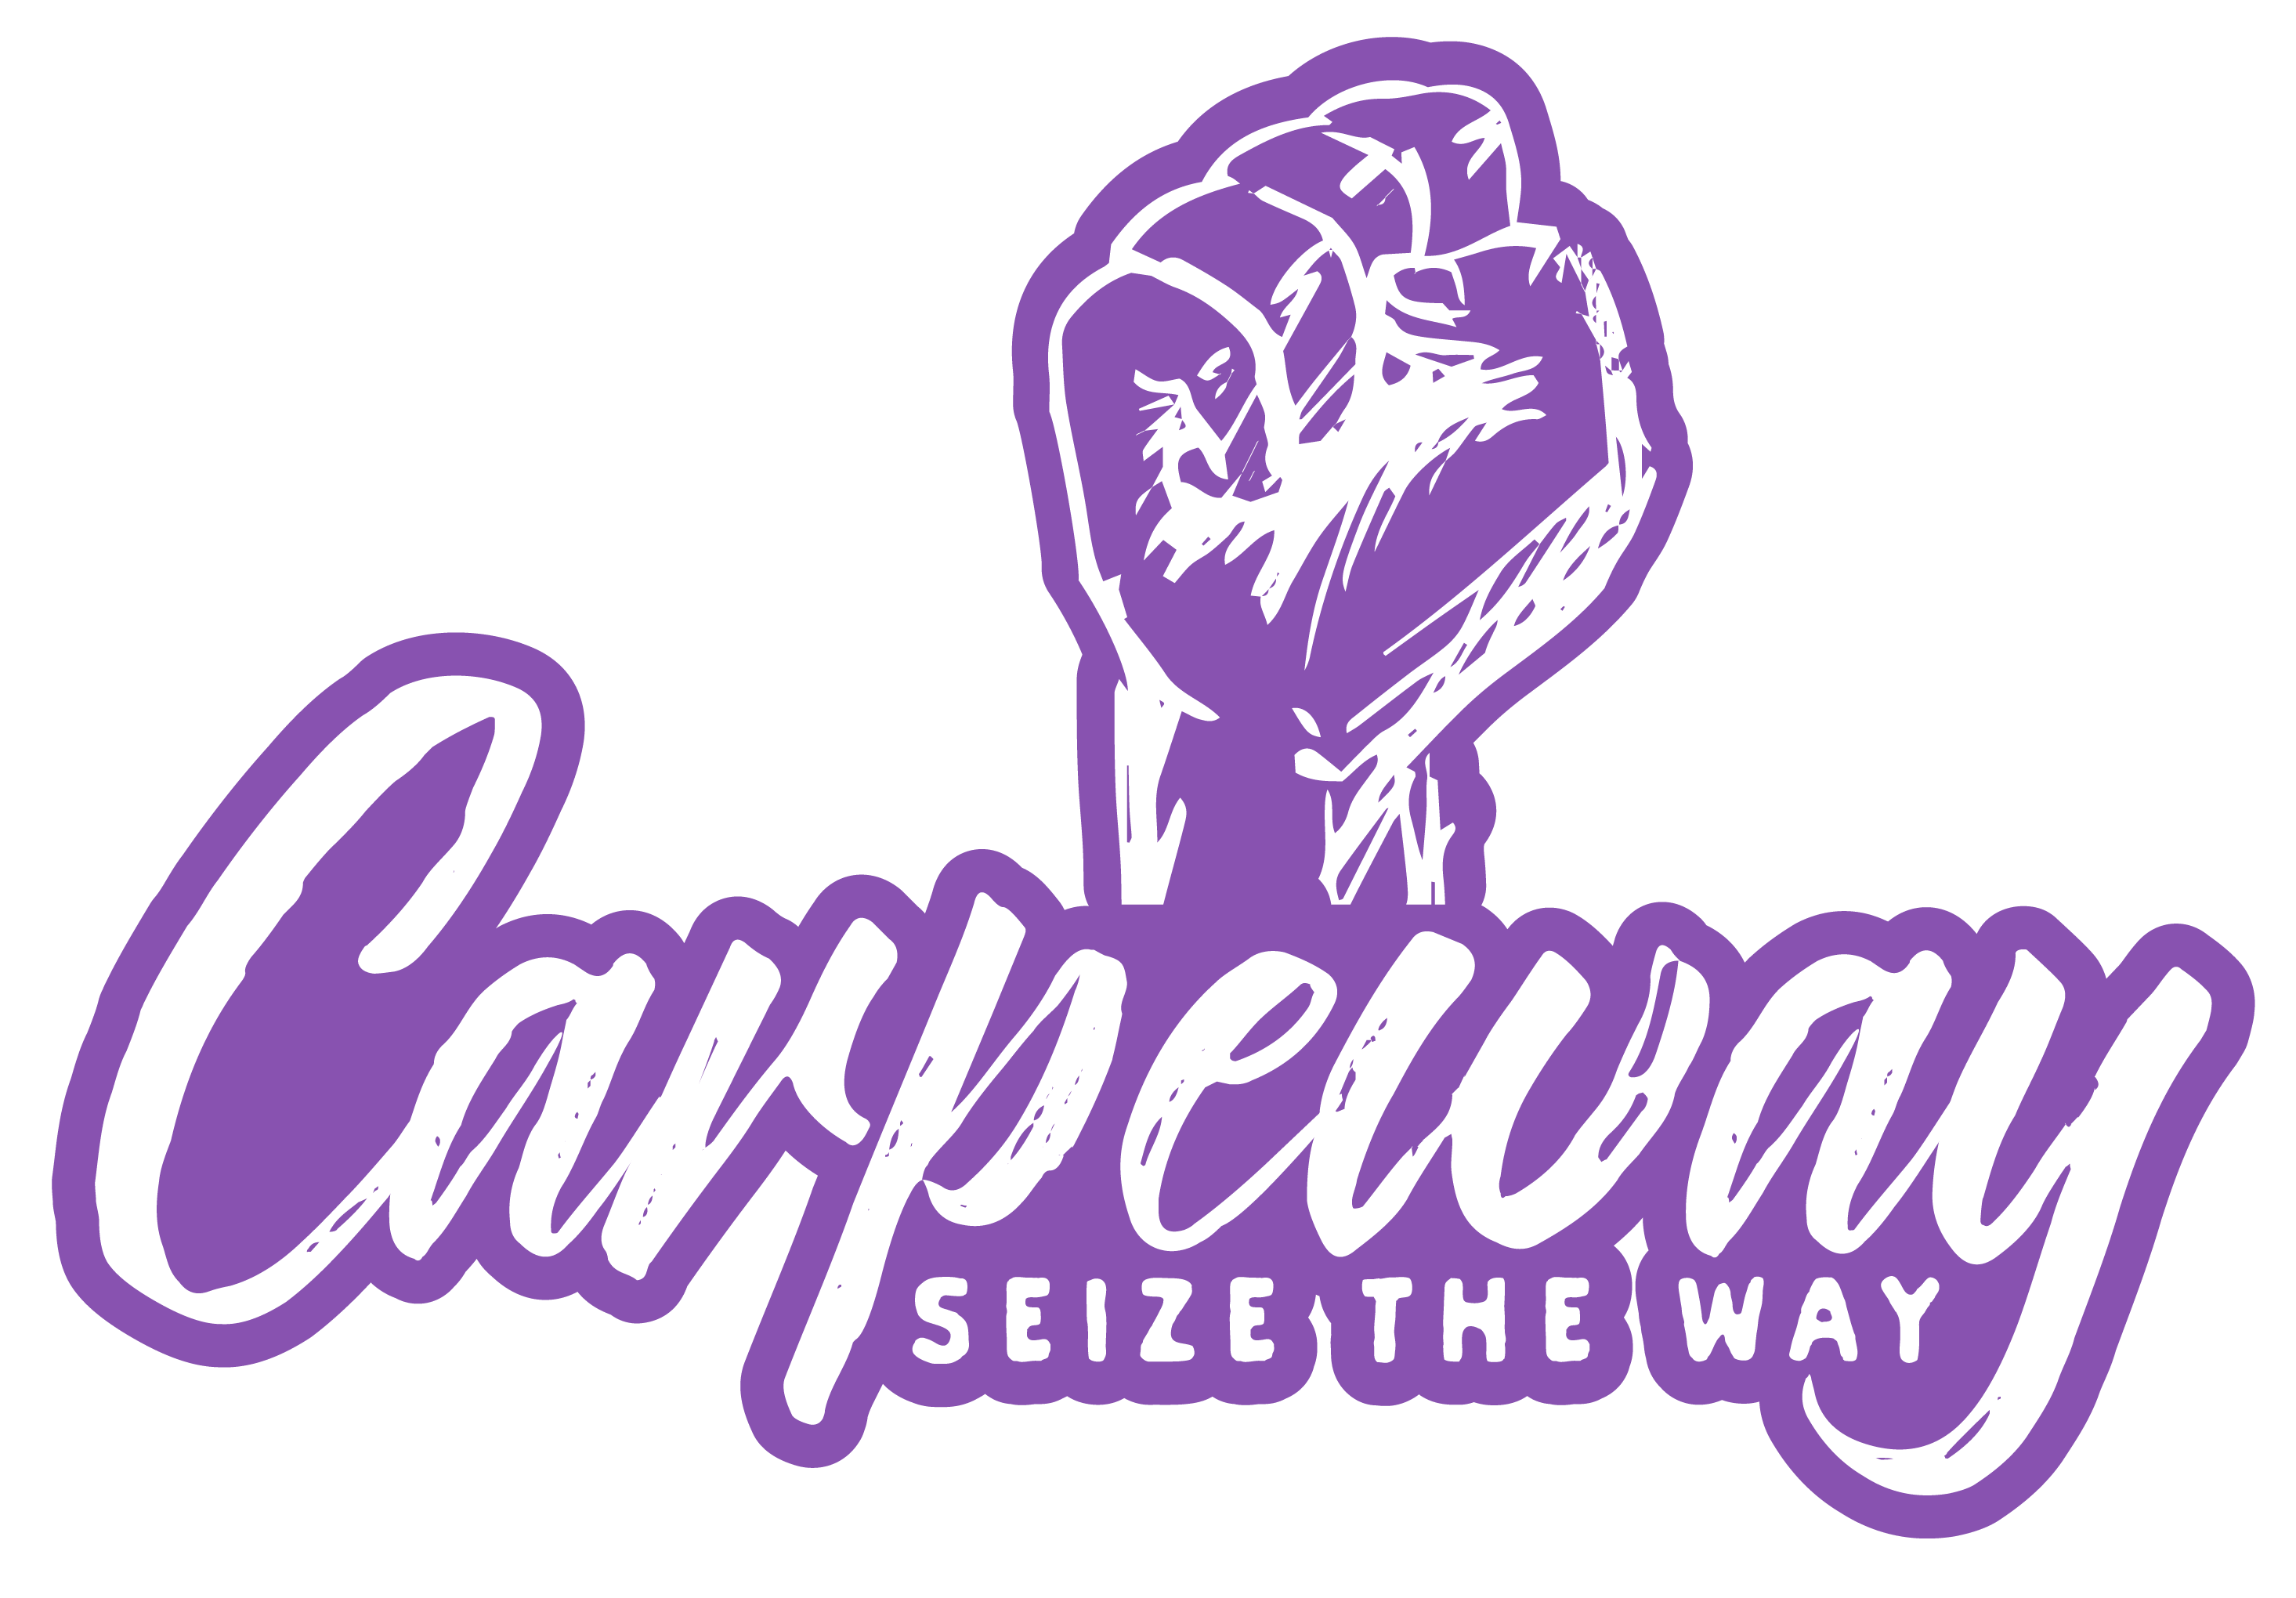 Carpeway